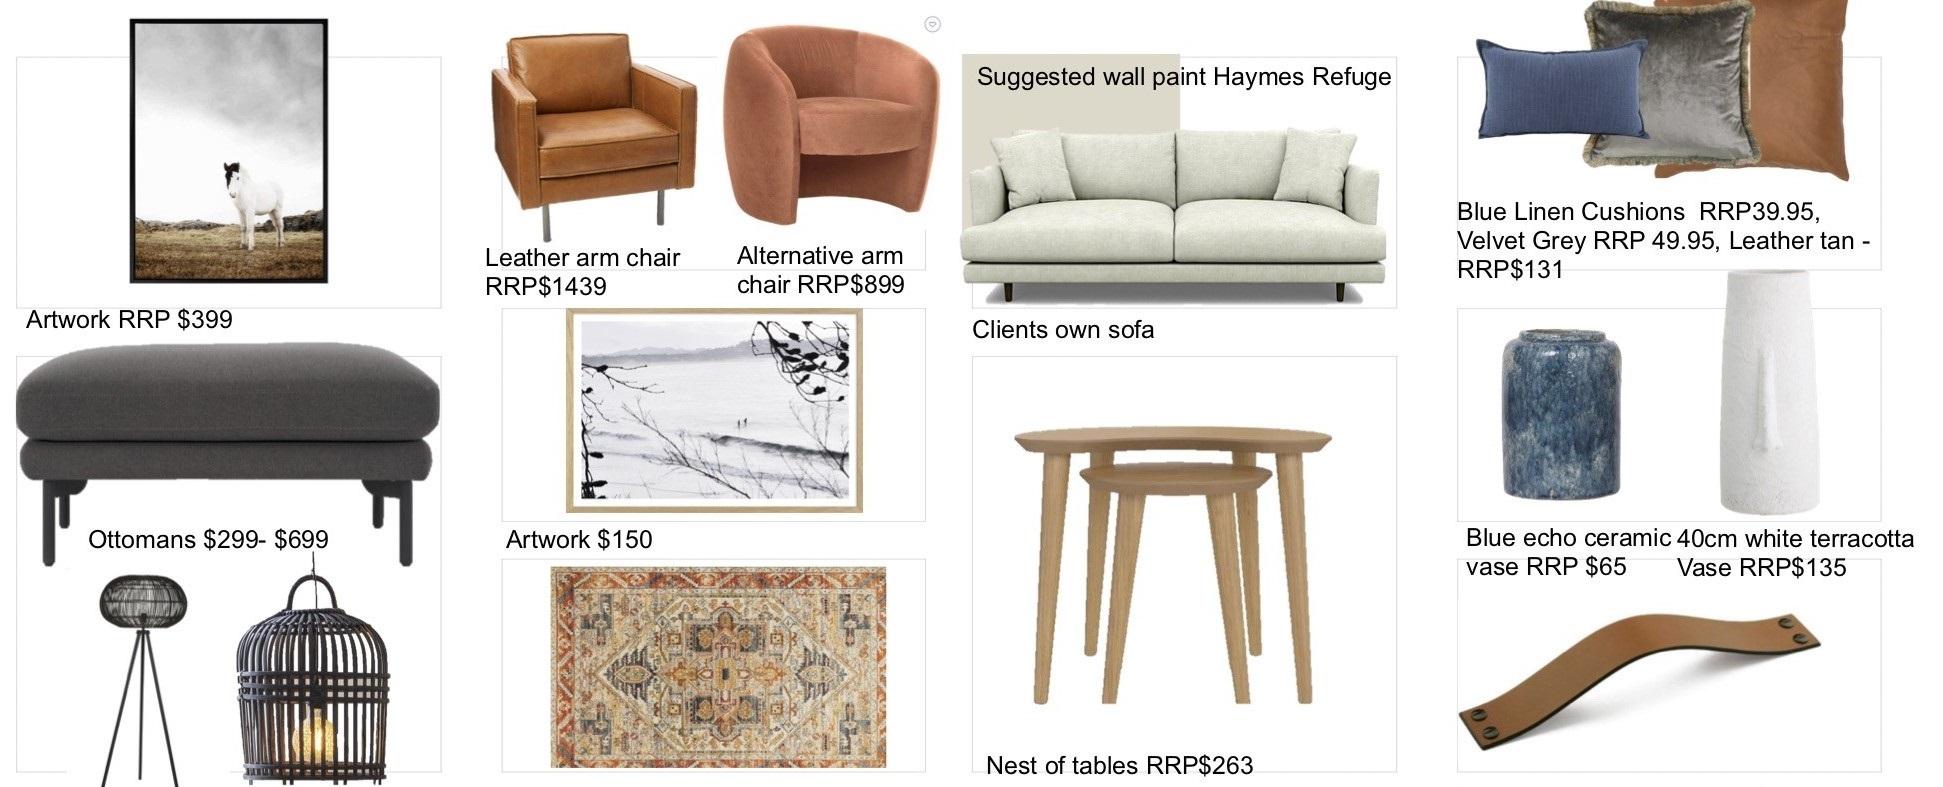 Final Shopping List for Judea's Living Room